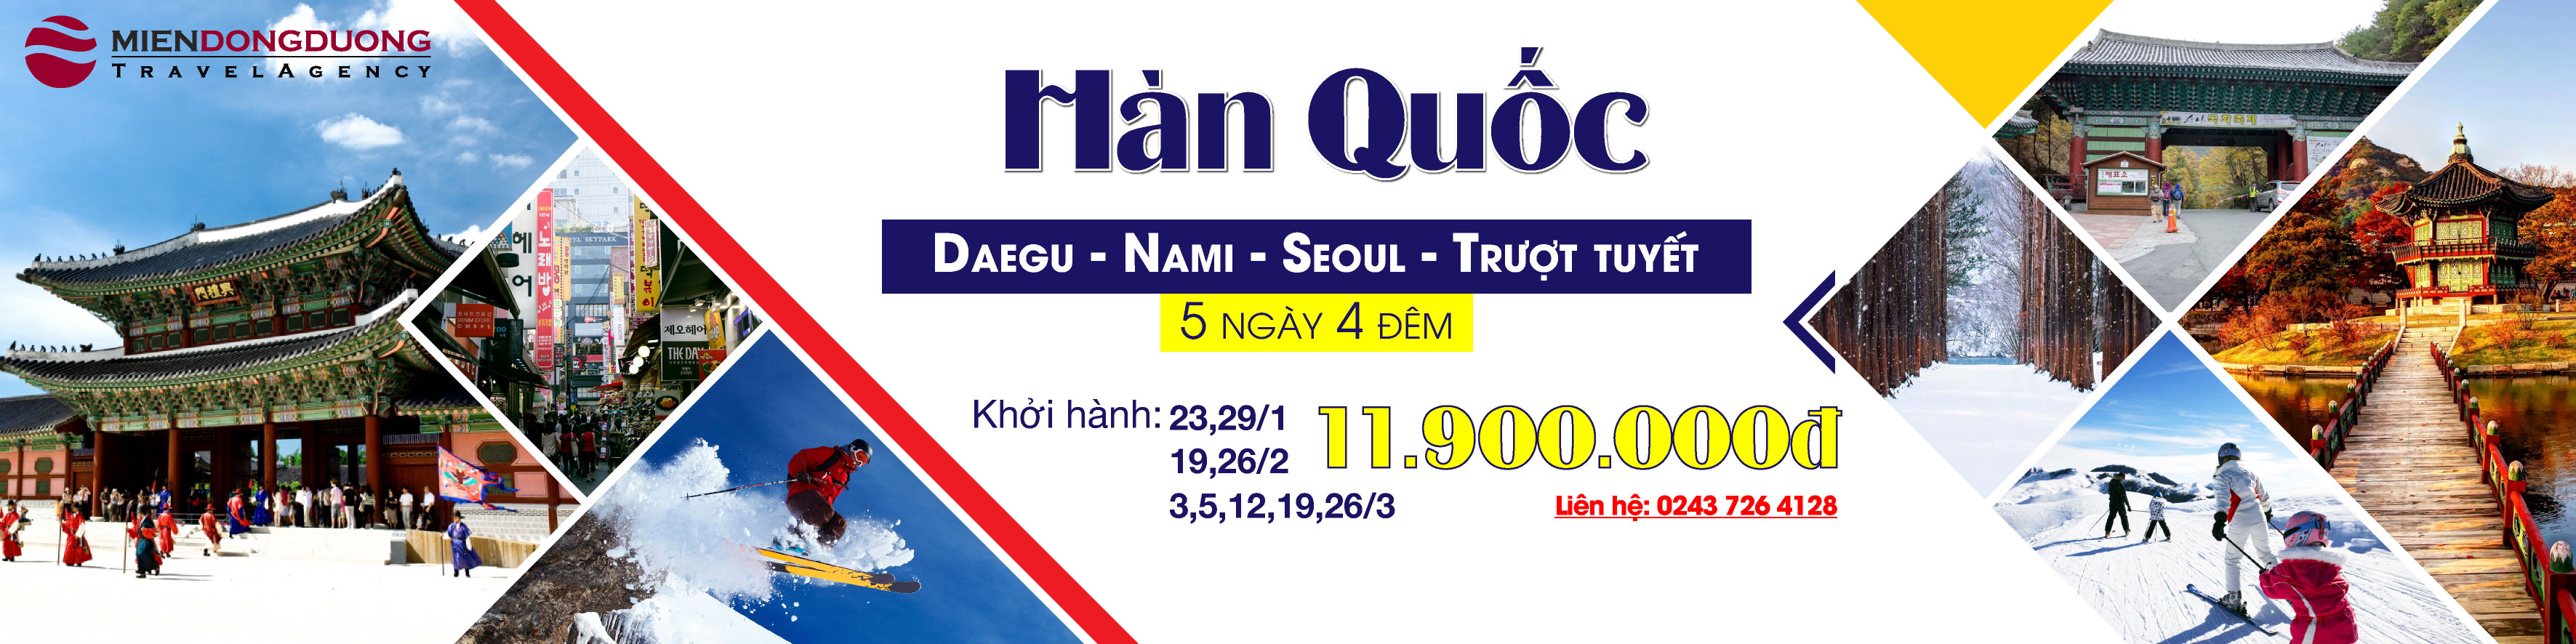 http://miendongduong.com/daegu-seoul-nami-trai-nghiem-truot-tuyet